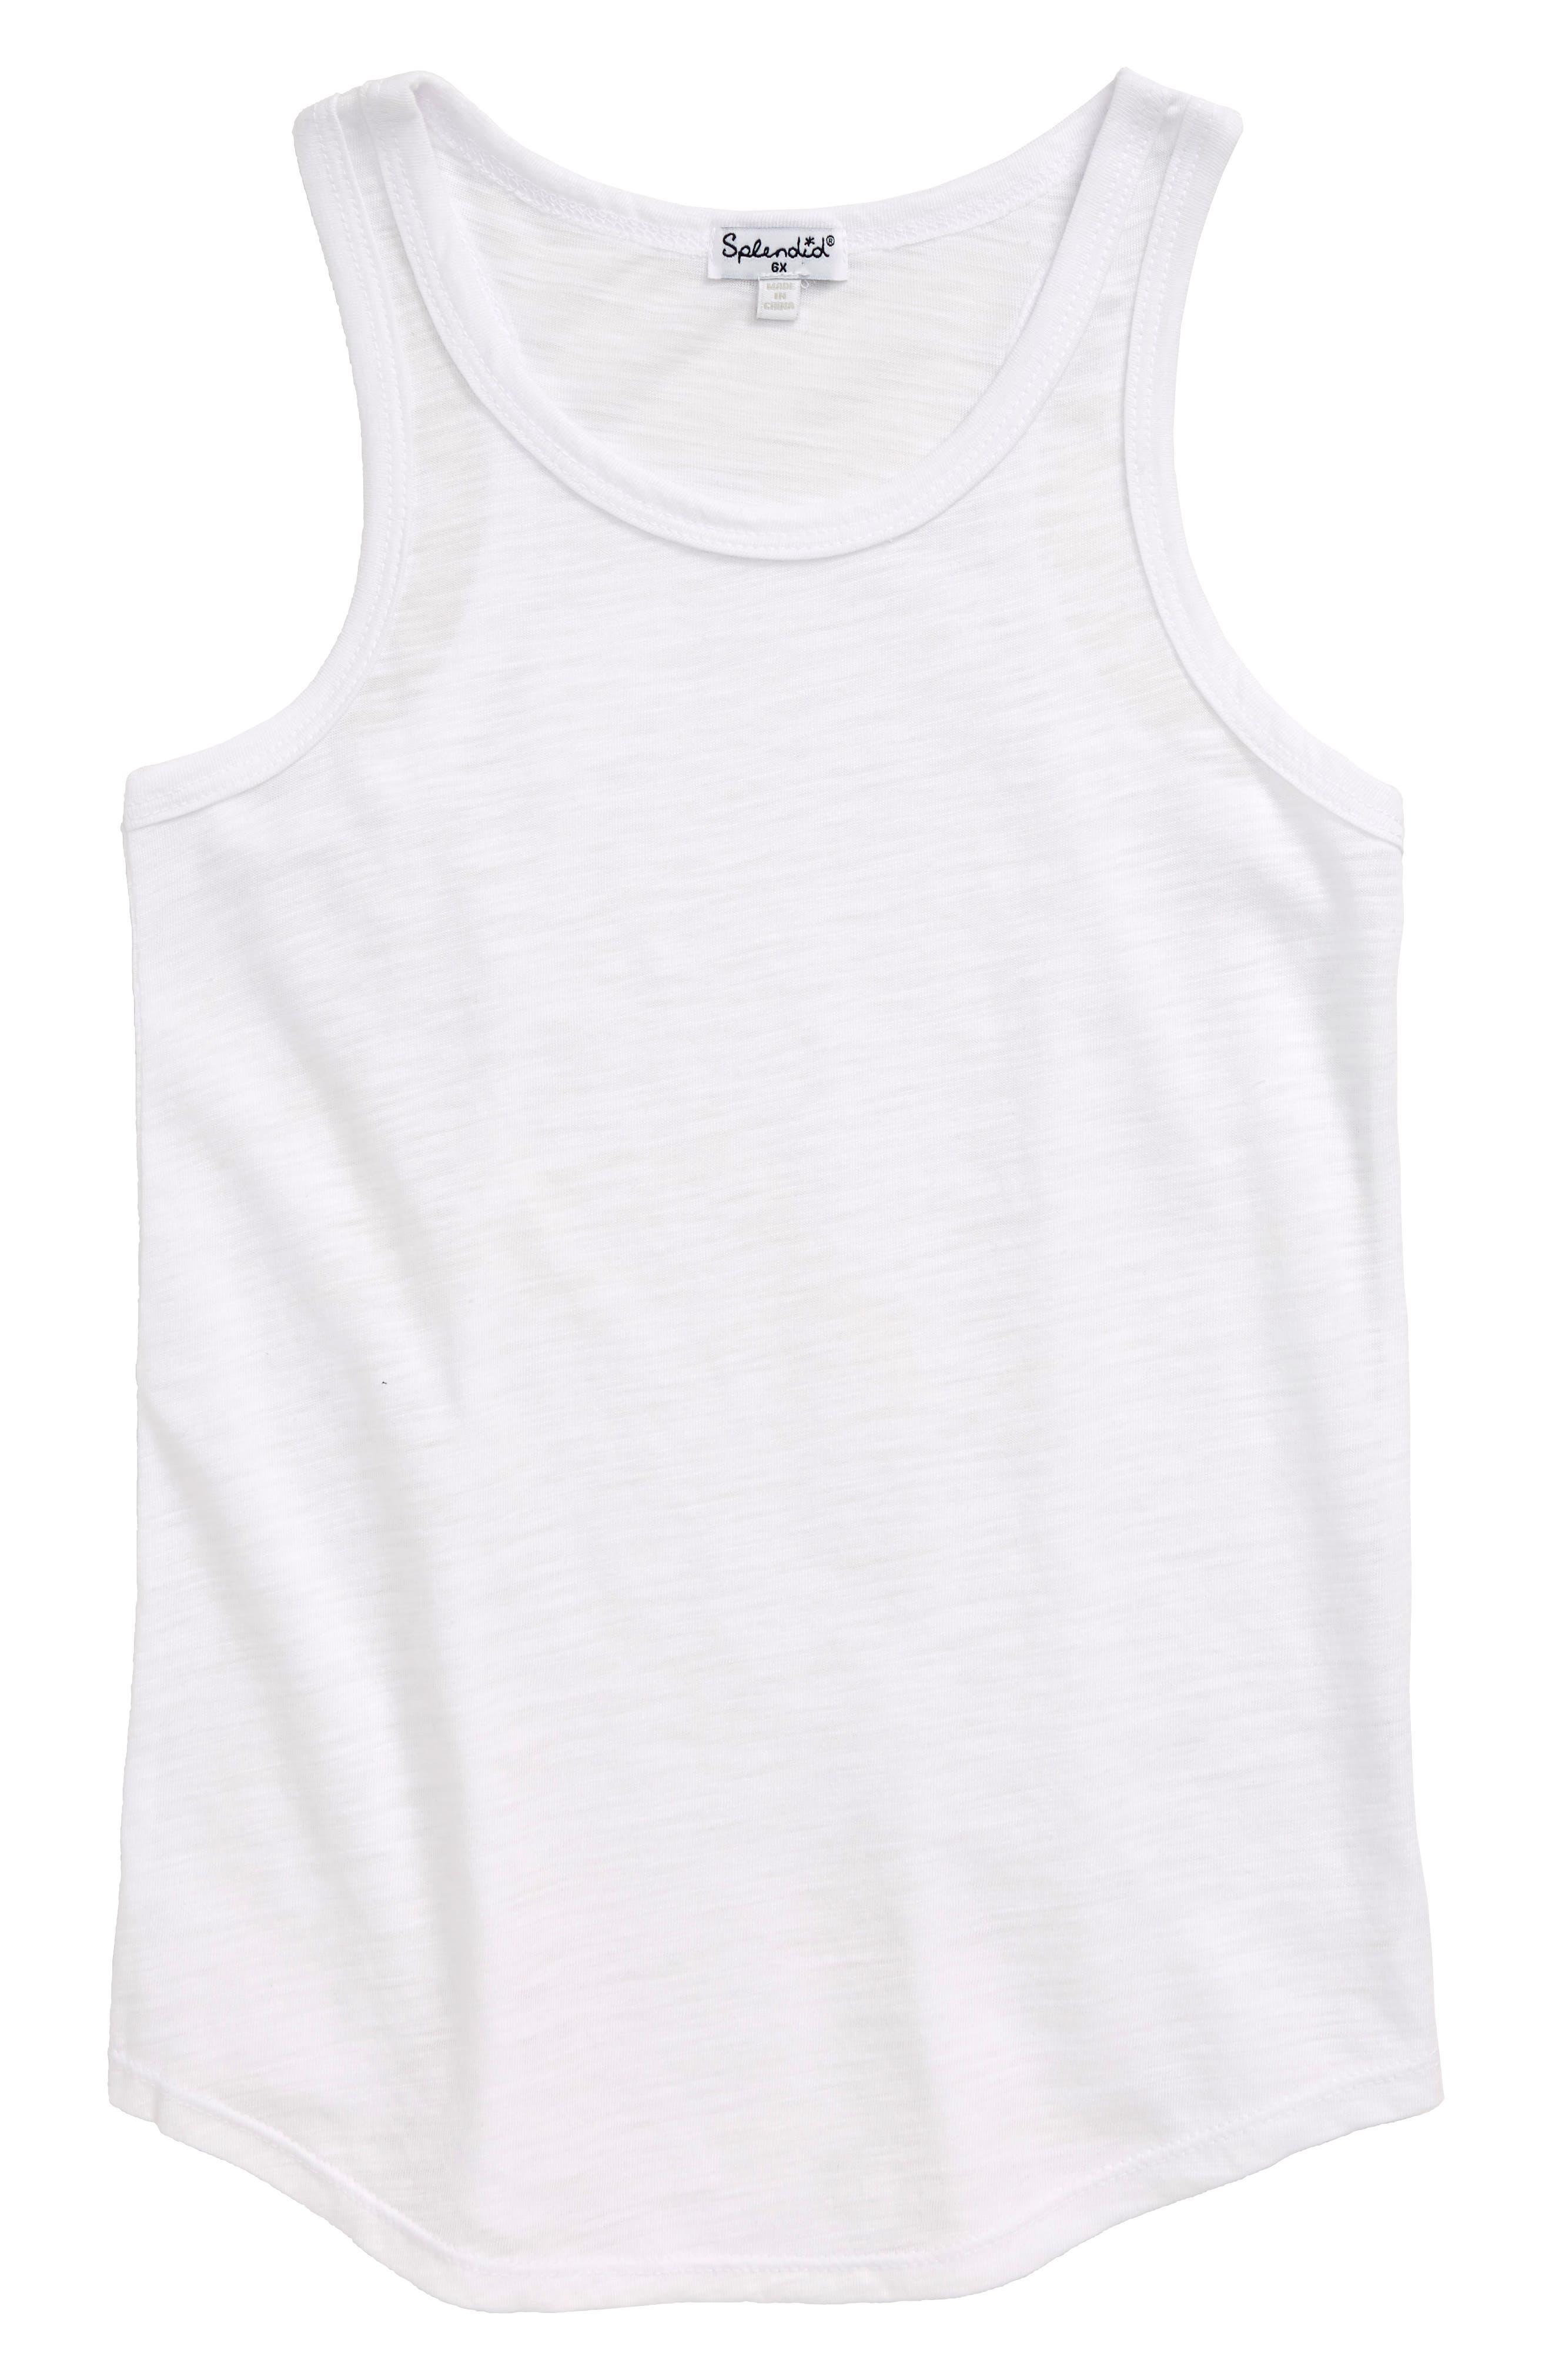 Toddler Girls Splendid Slub Tank Size 4T  White